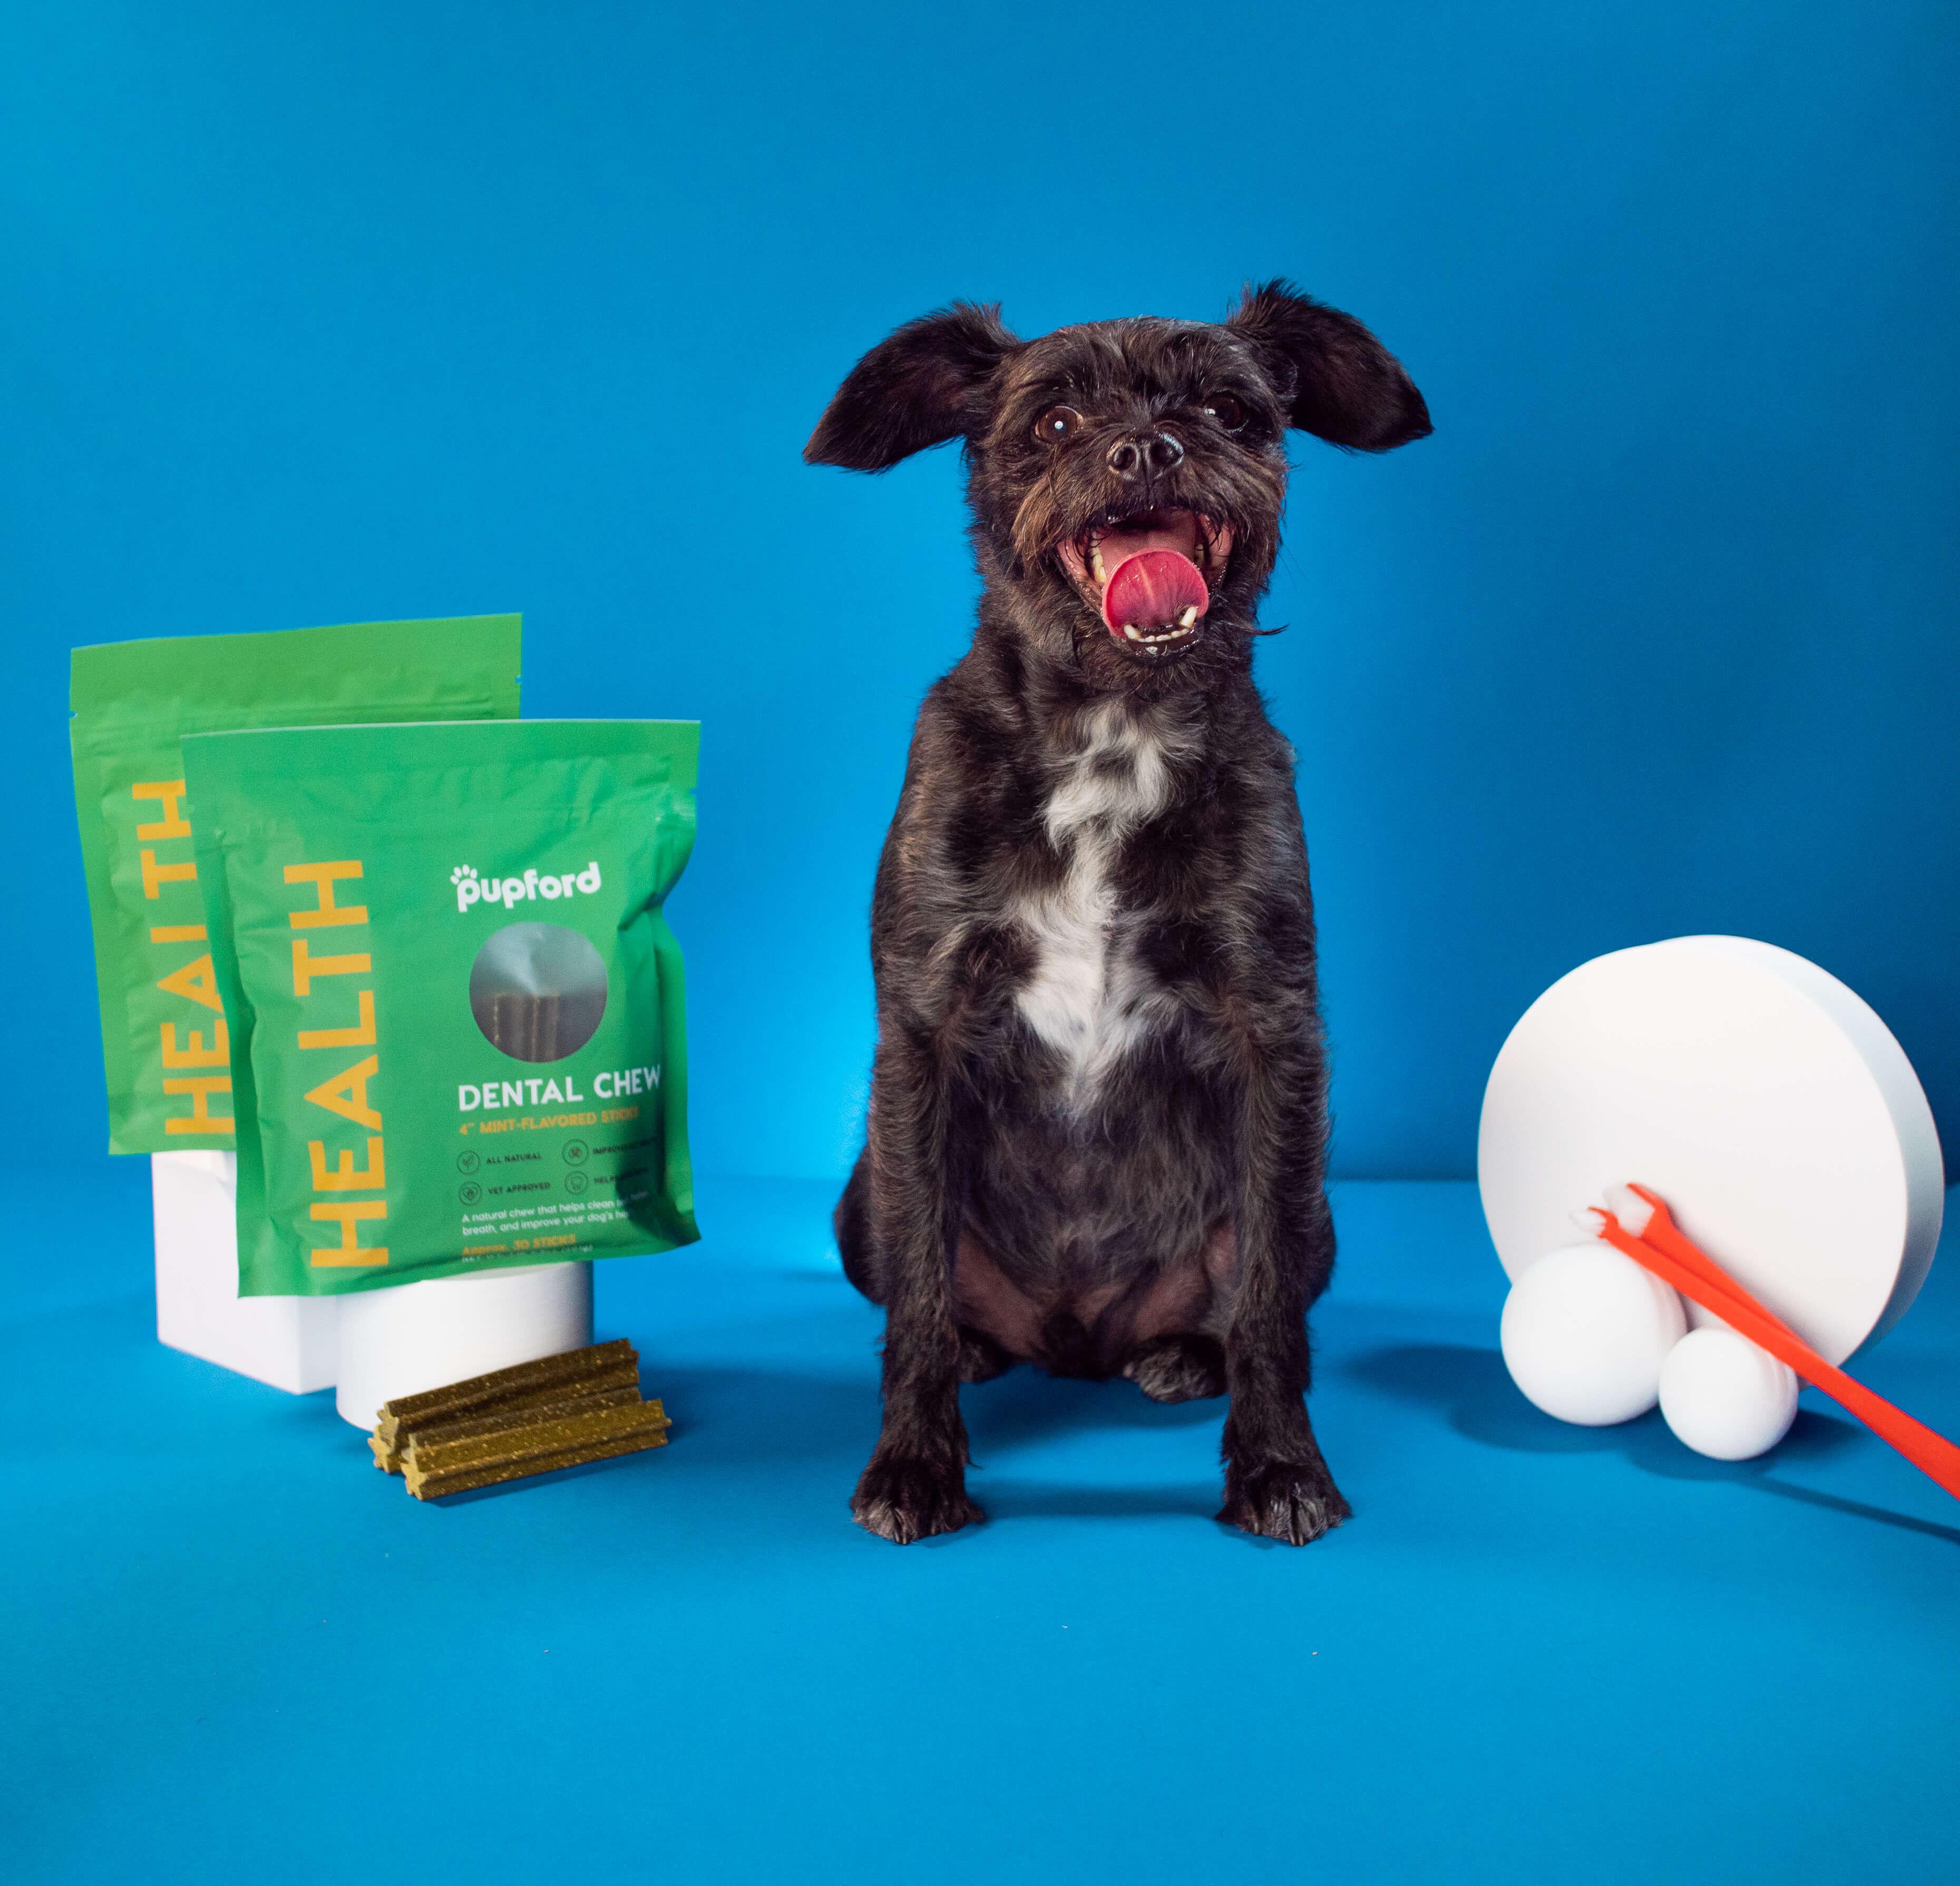 dog posing next to dental chews | Pupford